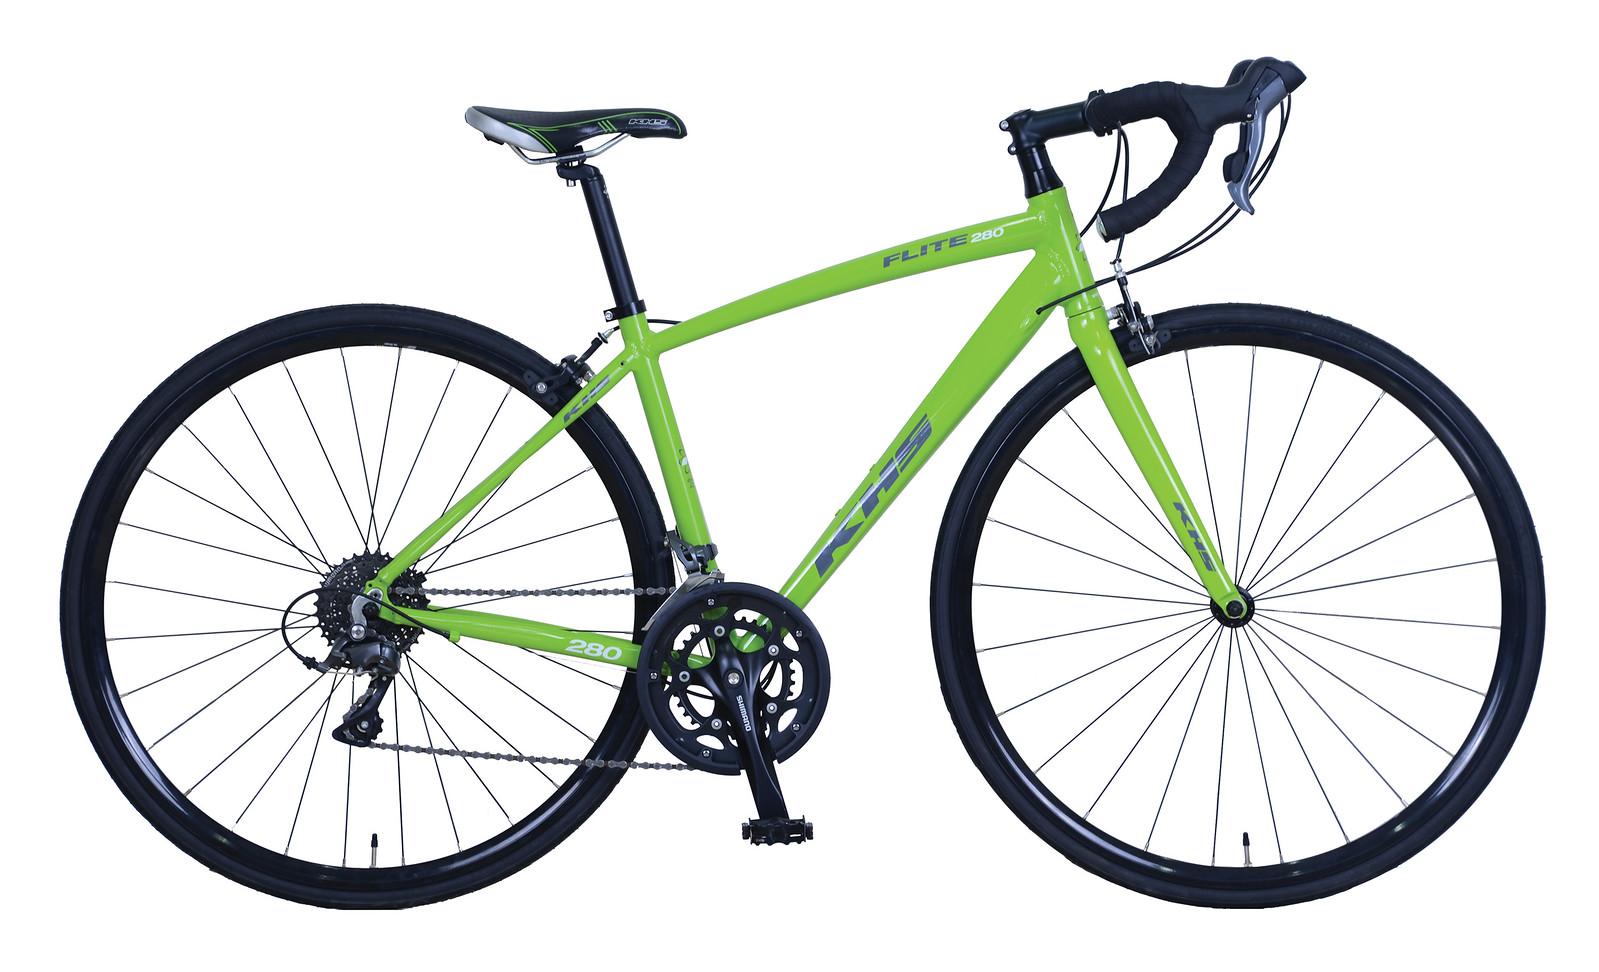 2018 Flite 280 Ladies-Lime Green-X3